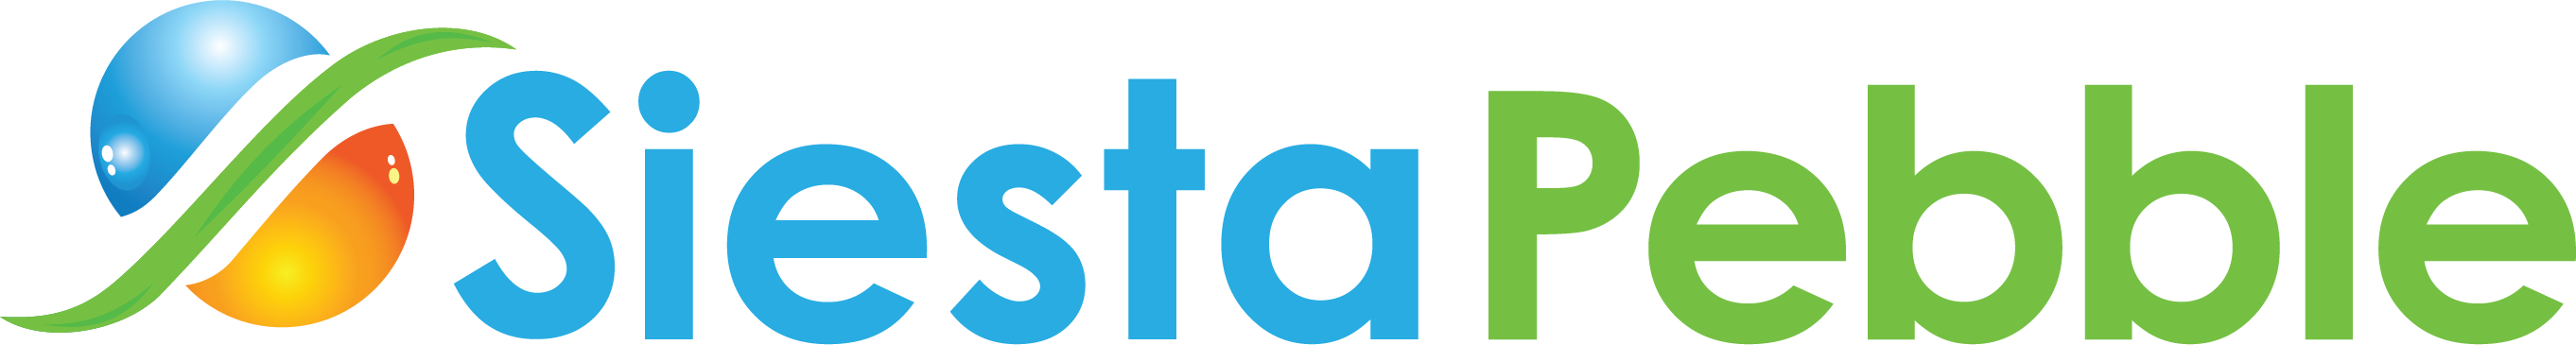 siesta pebble company logo